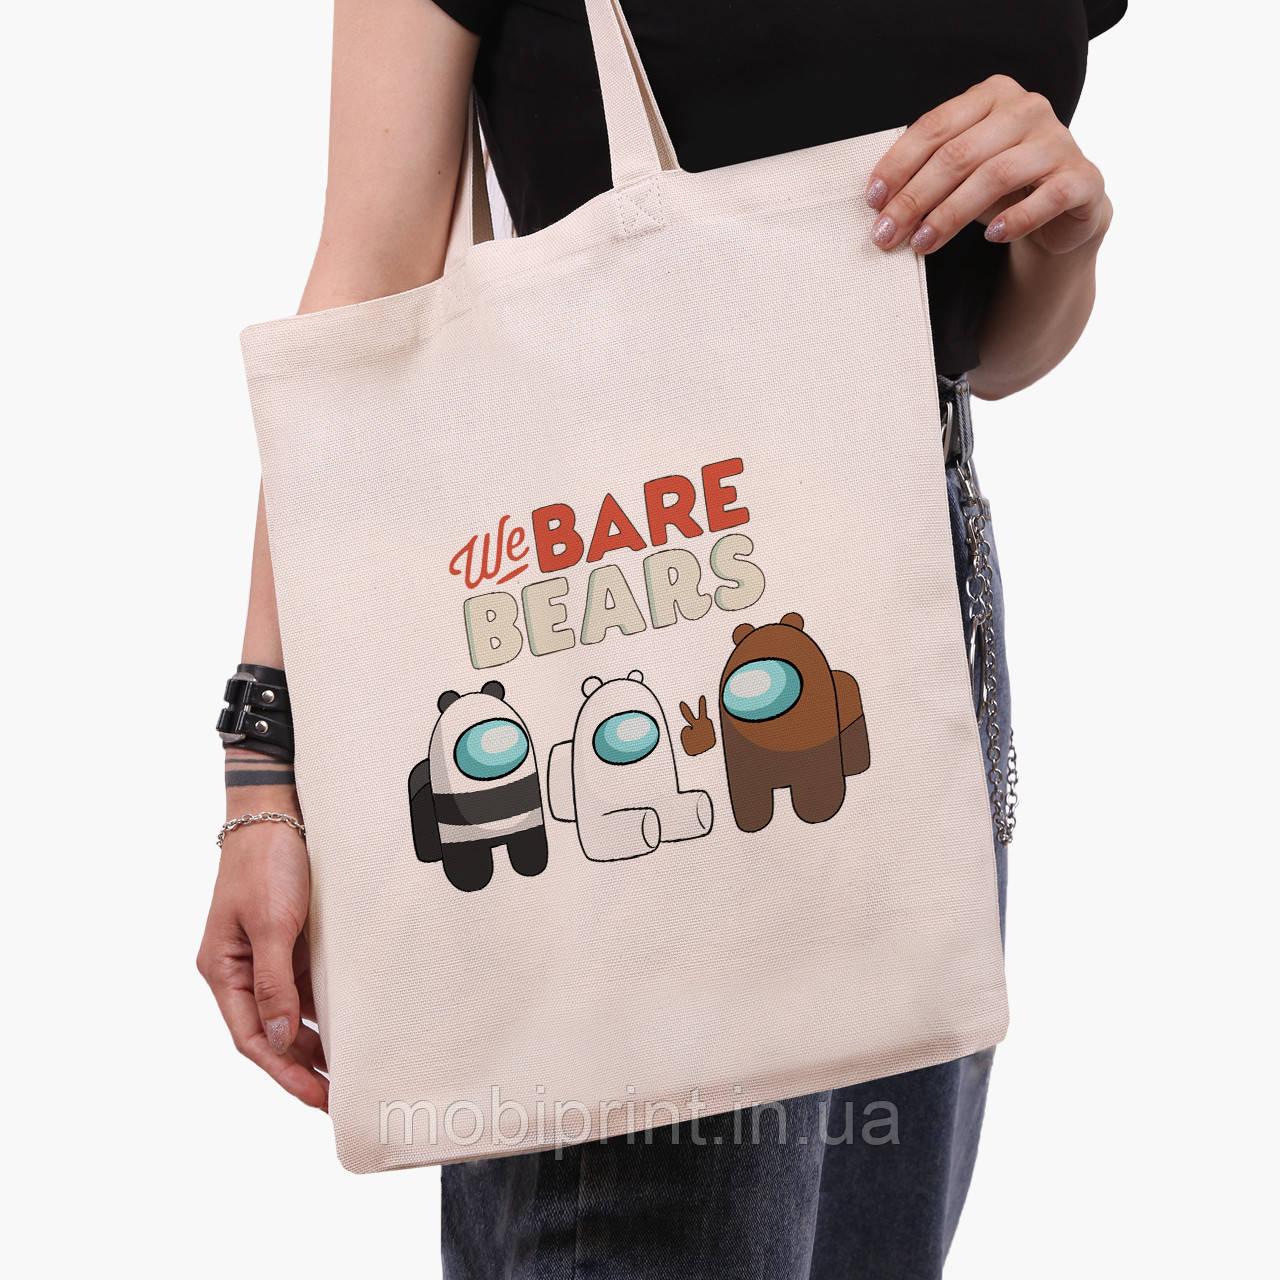 Эко сумка шоппер Вся правда о медведях (We Bare Bears) (9227-2668)  41*35 см